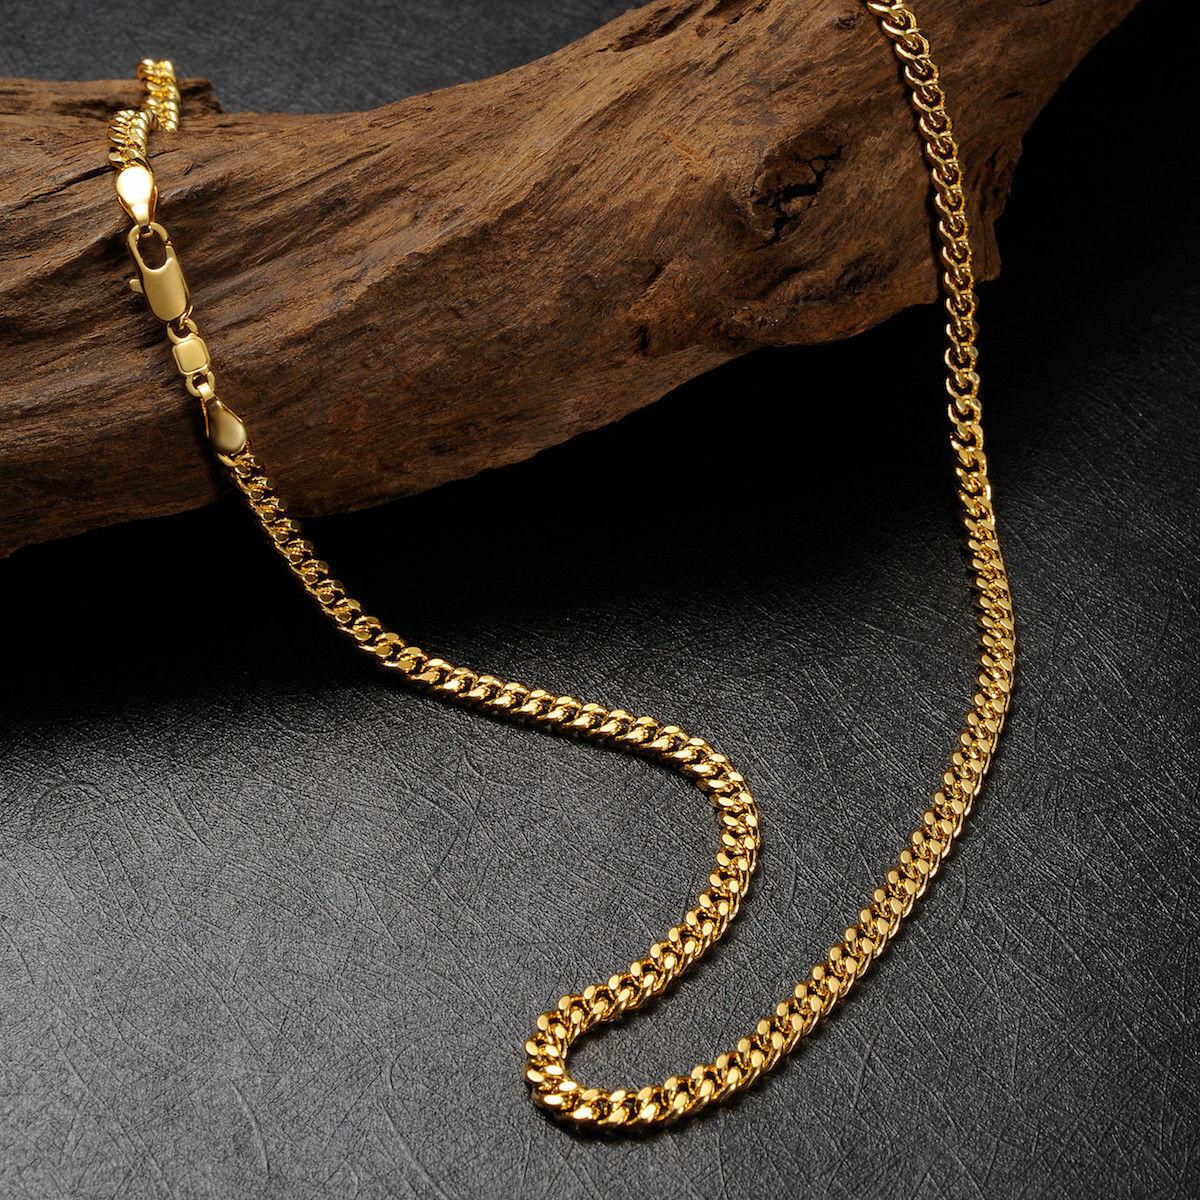 b6cc308652 Herren 24k gold Halskette 3.5mm Panzerkette Echte 999er Gold vergoldet 60cm